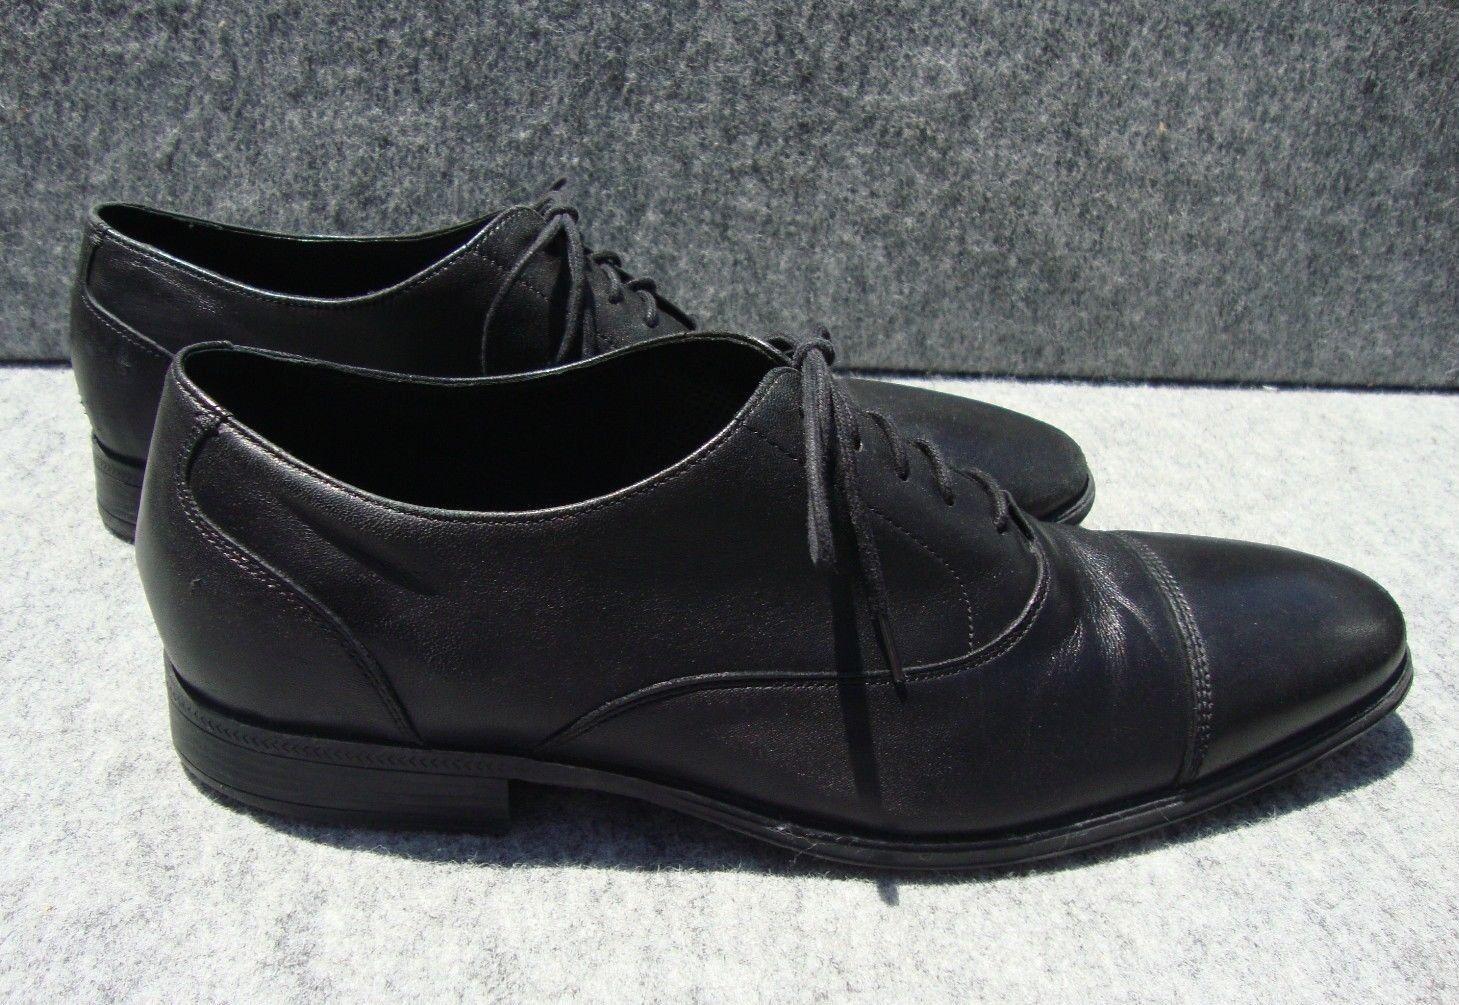 Cole Haan Black C09168 Black Haan Cap Toe Oxfords Men's Size 13M 443766